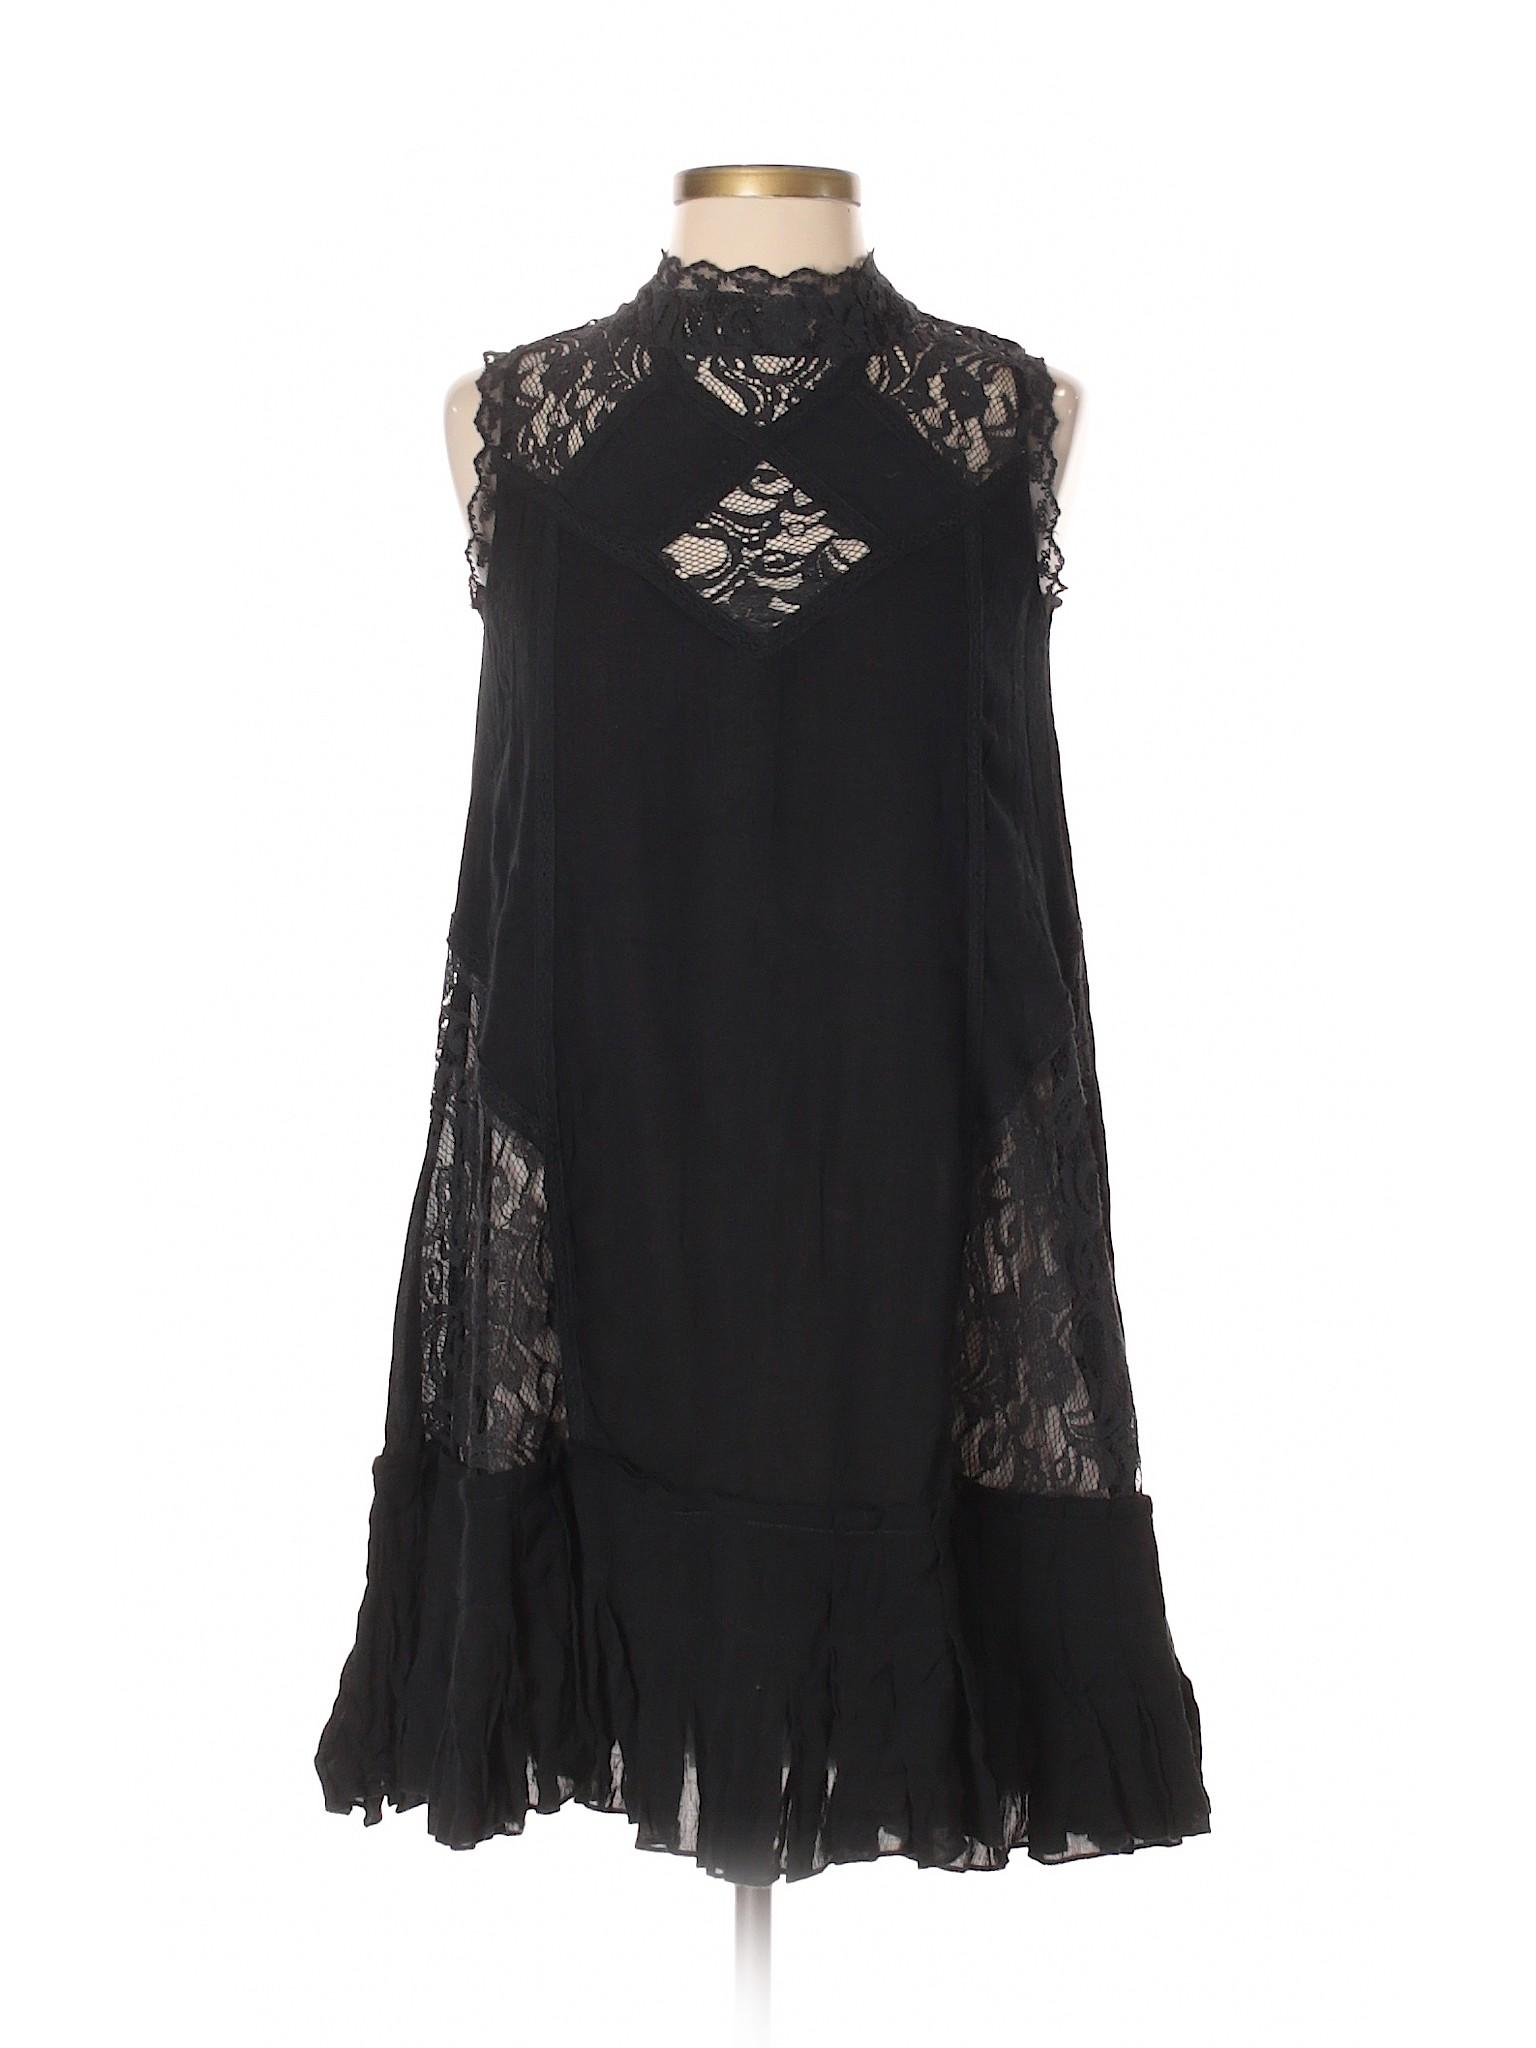 Gentle Gentle Selling Fawn Selling Gentle Selling Casual Dress Fawn Dress Casual a5dwqAa